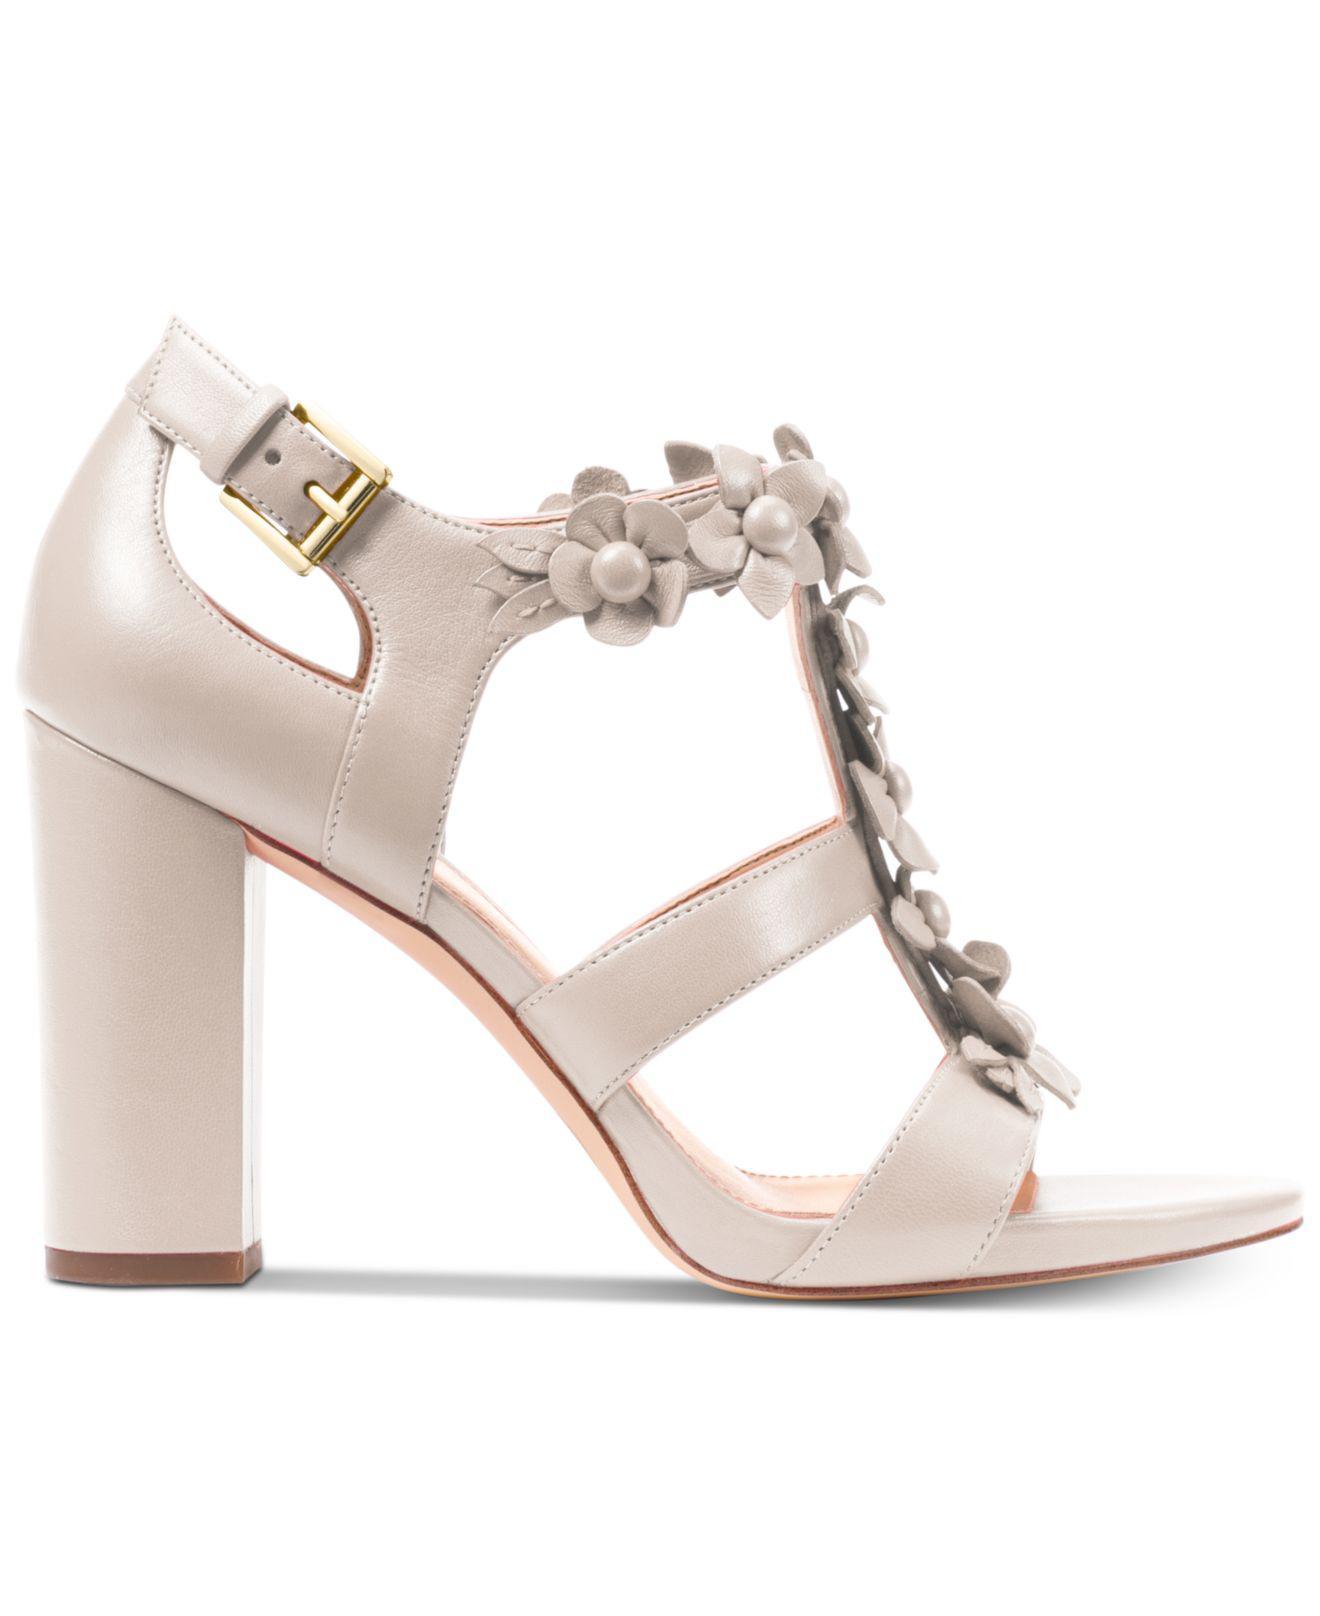 4aa7a057daa Michael Kors Tricia Block-heel T-strap Dress Sandals - Lyst